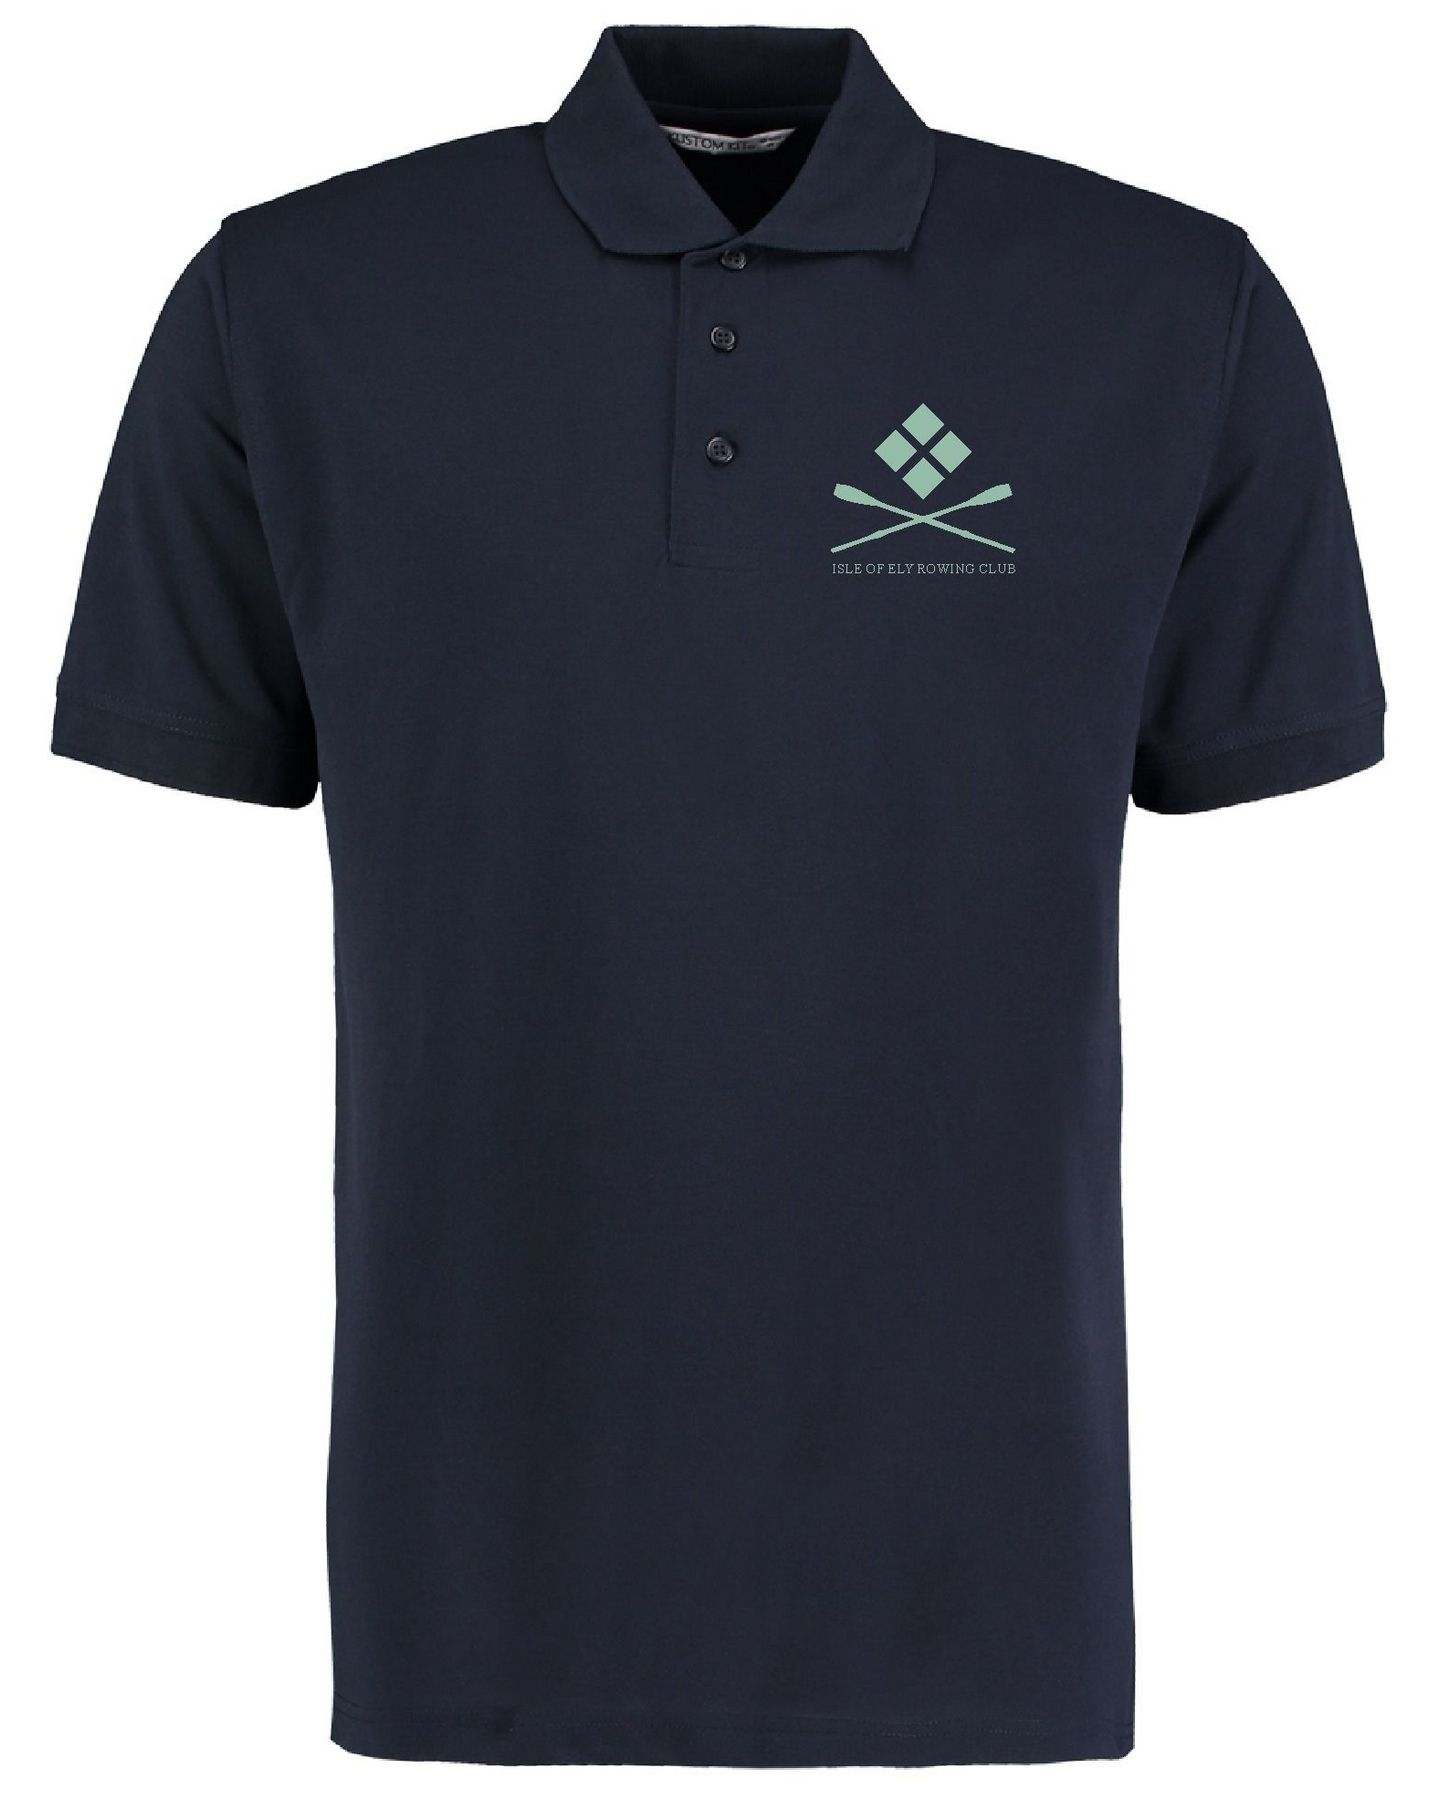 IOERC – Polo Shirt (Unisex)